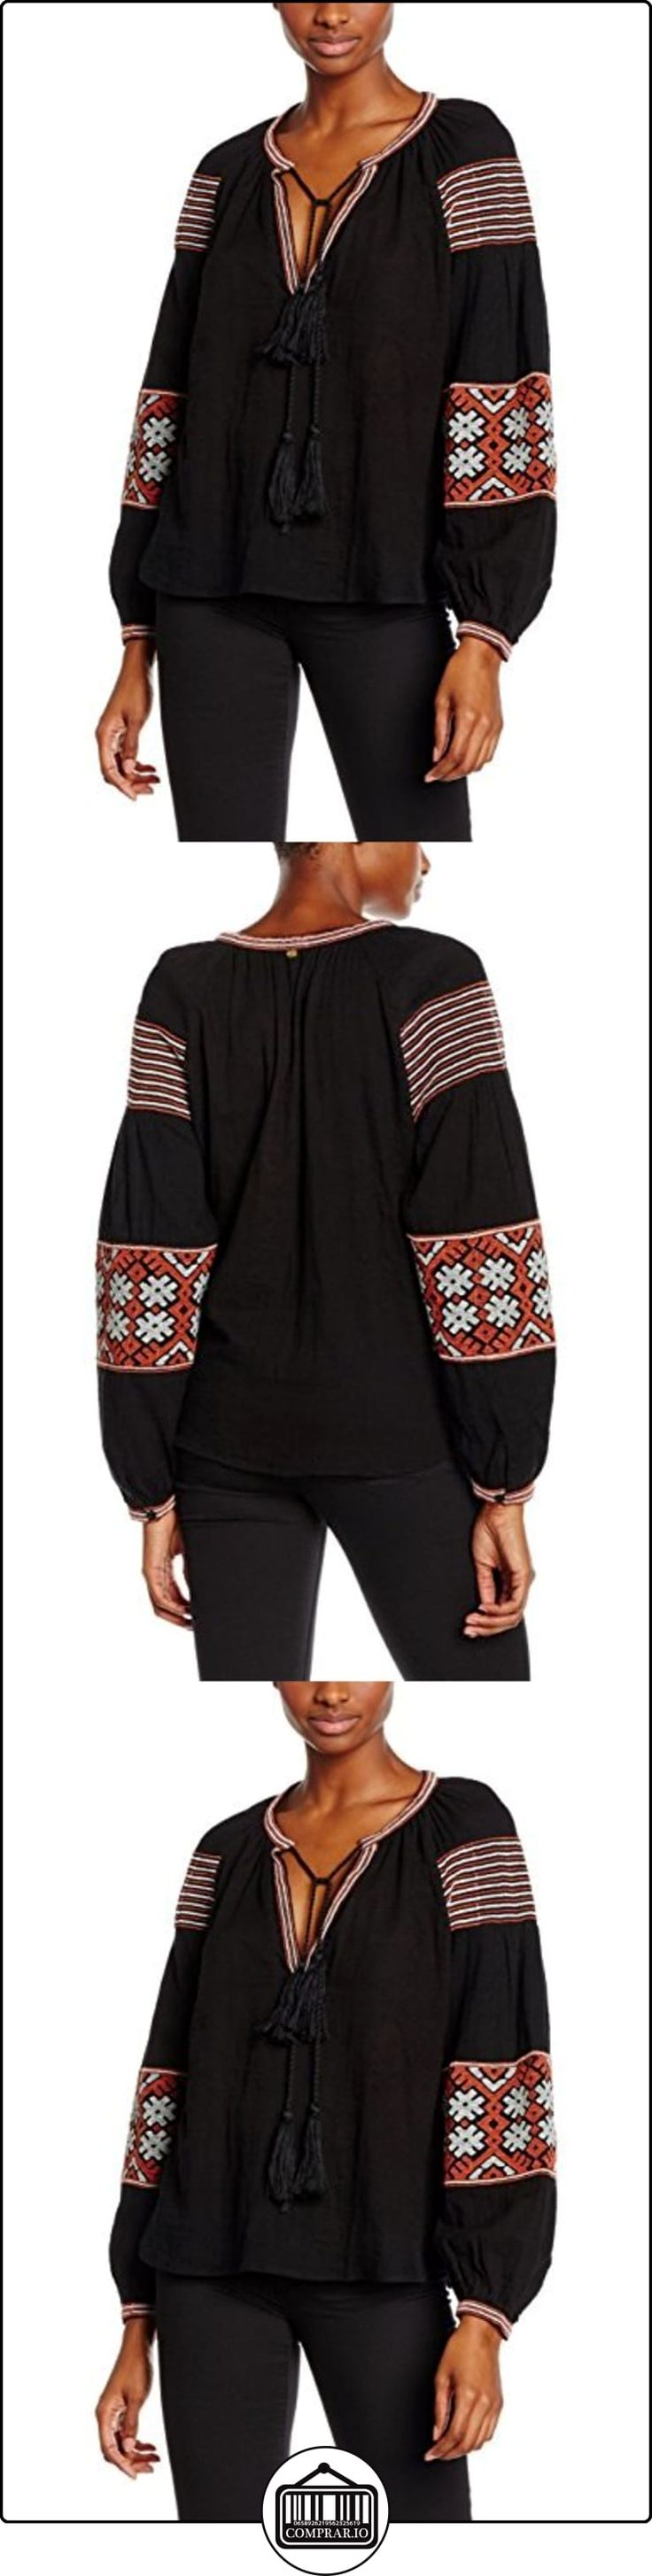 Antik Batik Modi, Blusa para Mujer, Negro (Faded Black), S  ✿ Blusas y camisas ✿